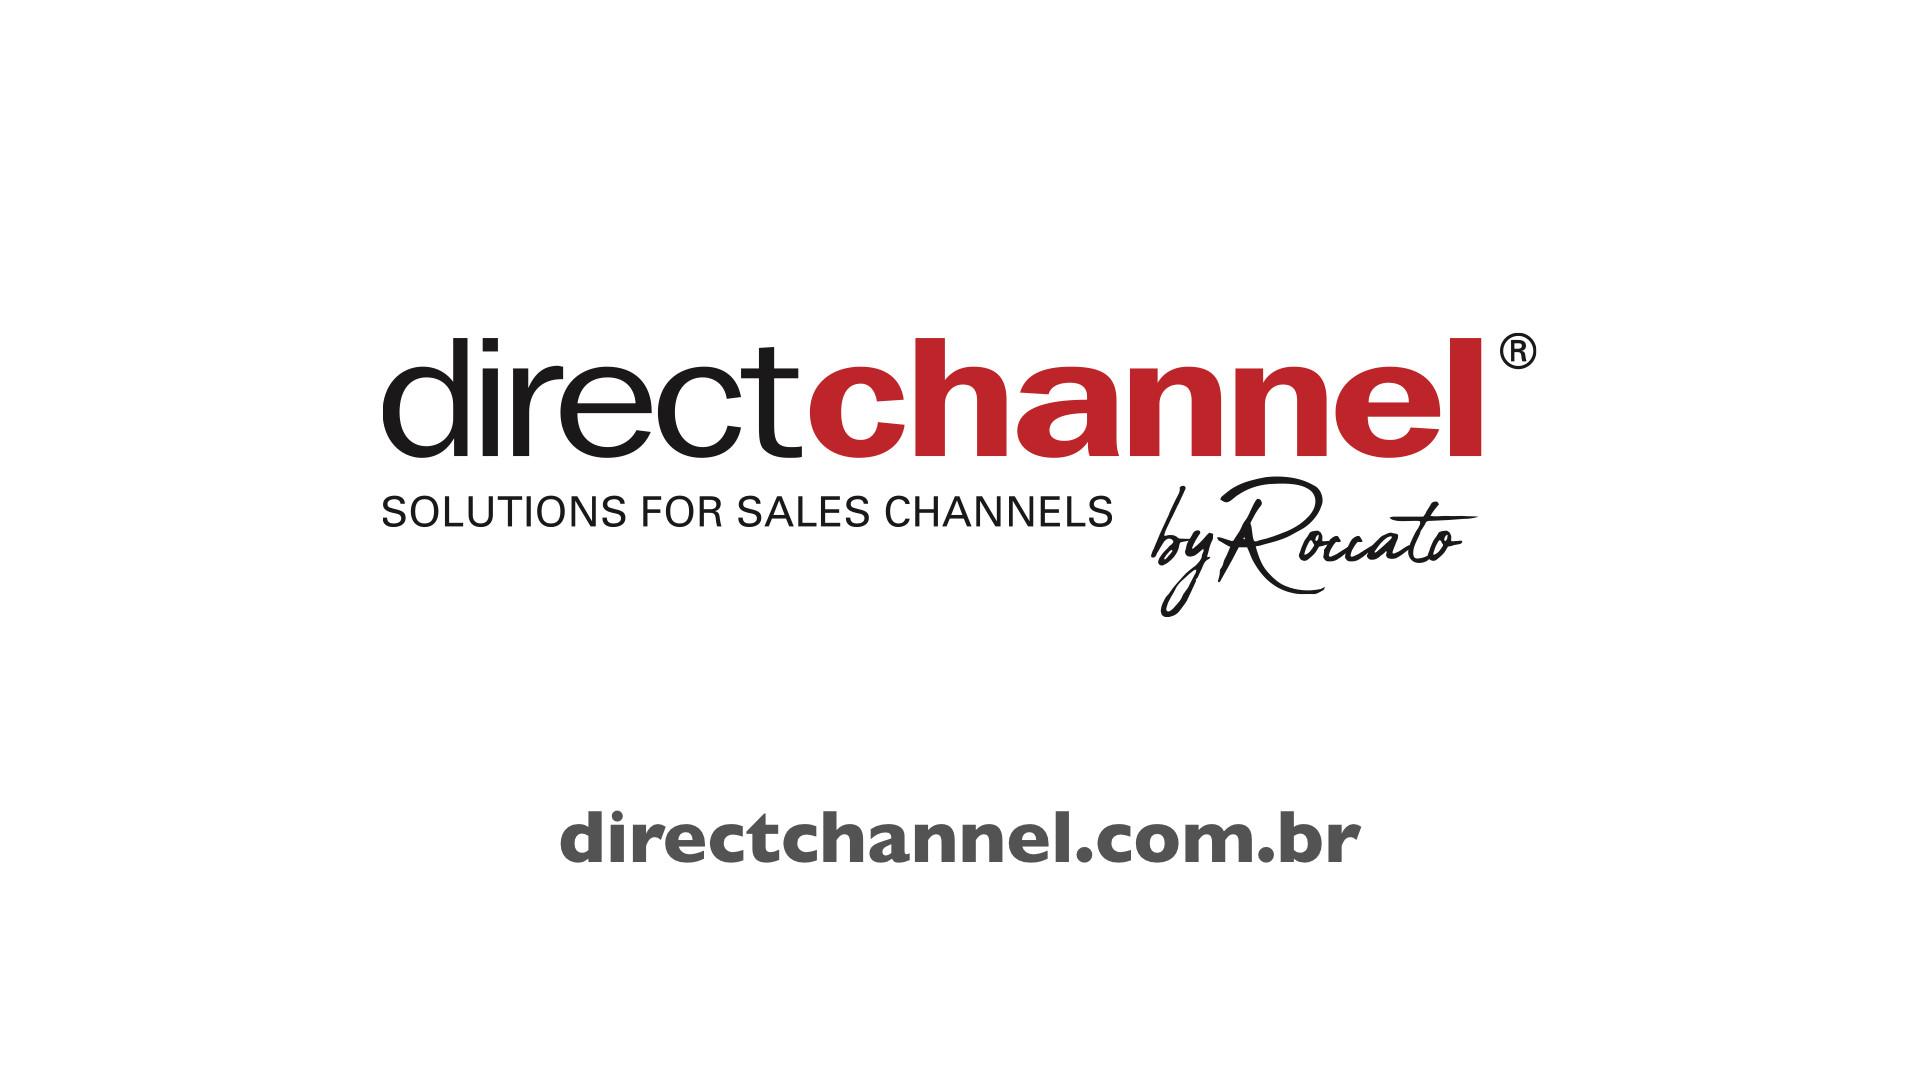 (c) Directchannel.com.br